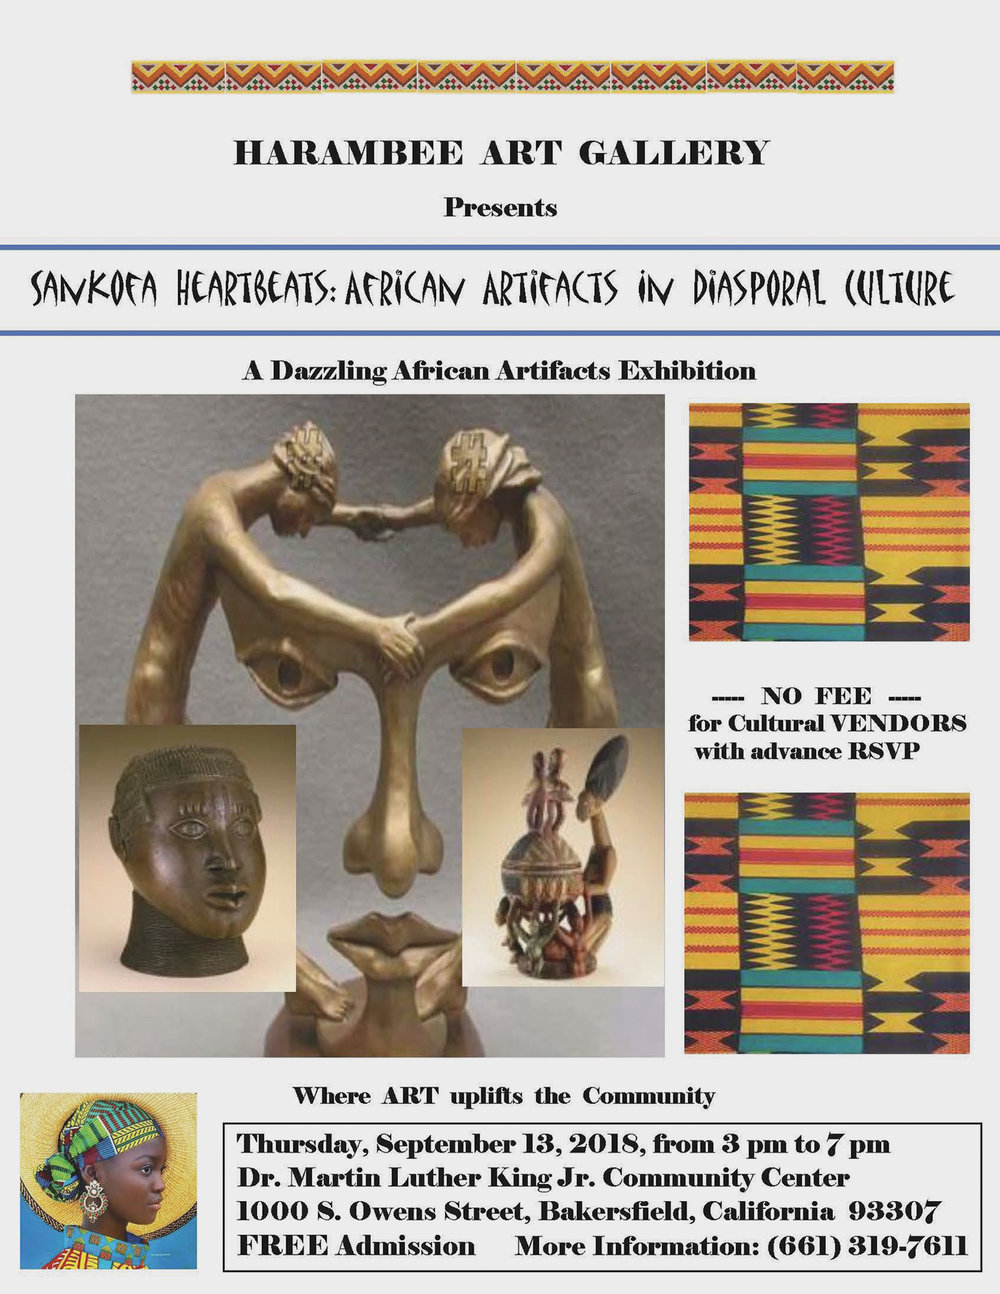 Cultural Images Matter- African Heritage In Diasporal Culture pic.jpg